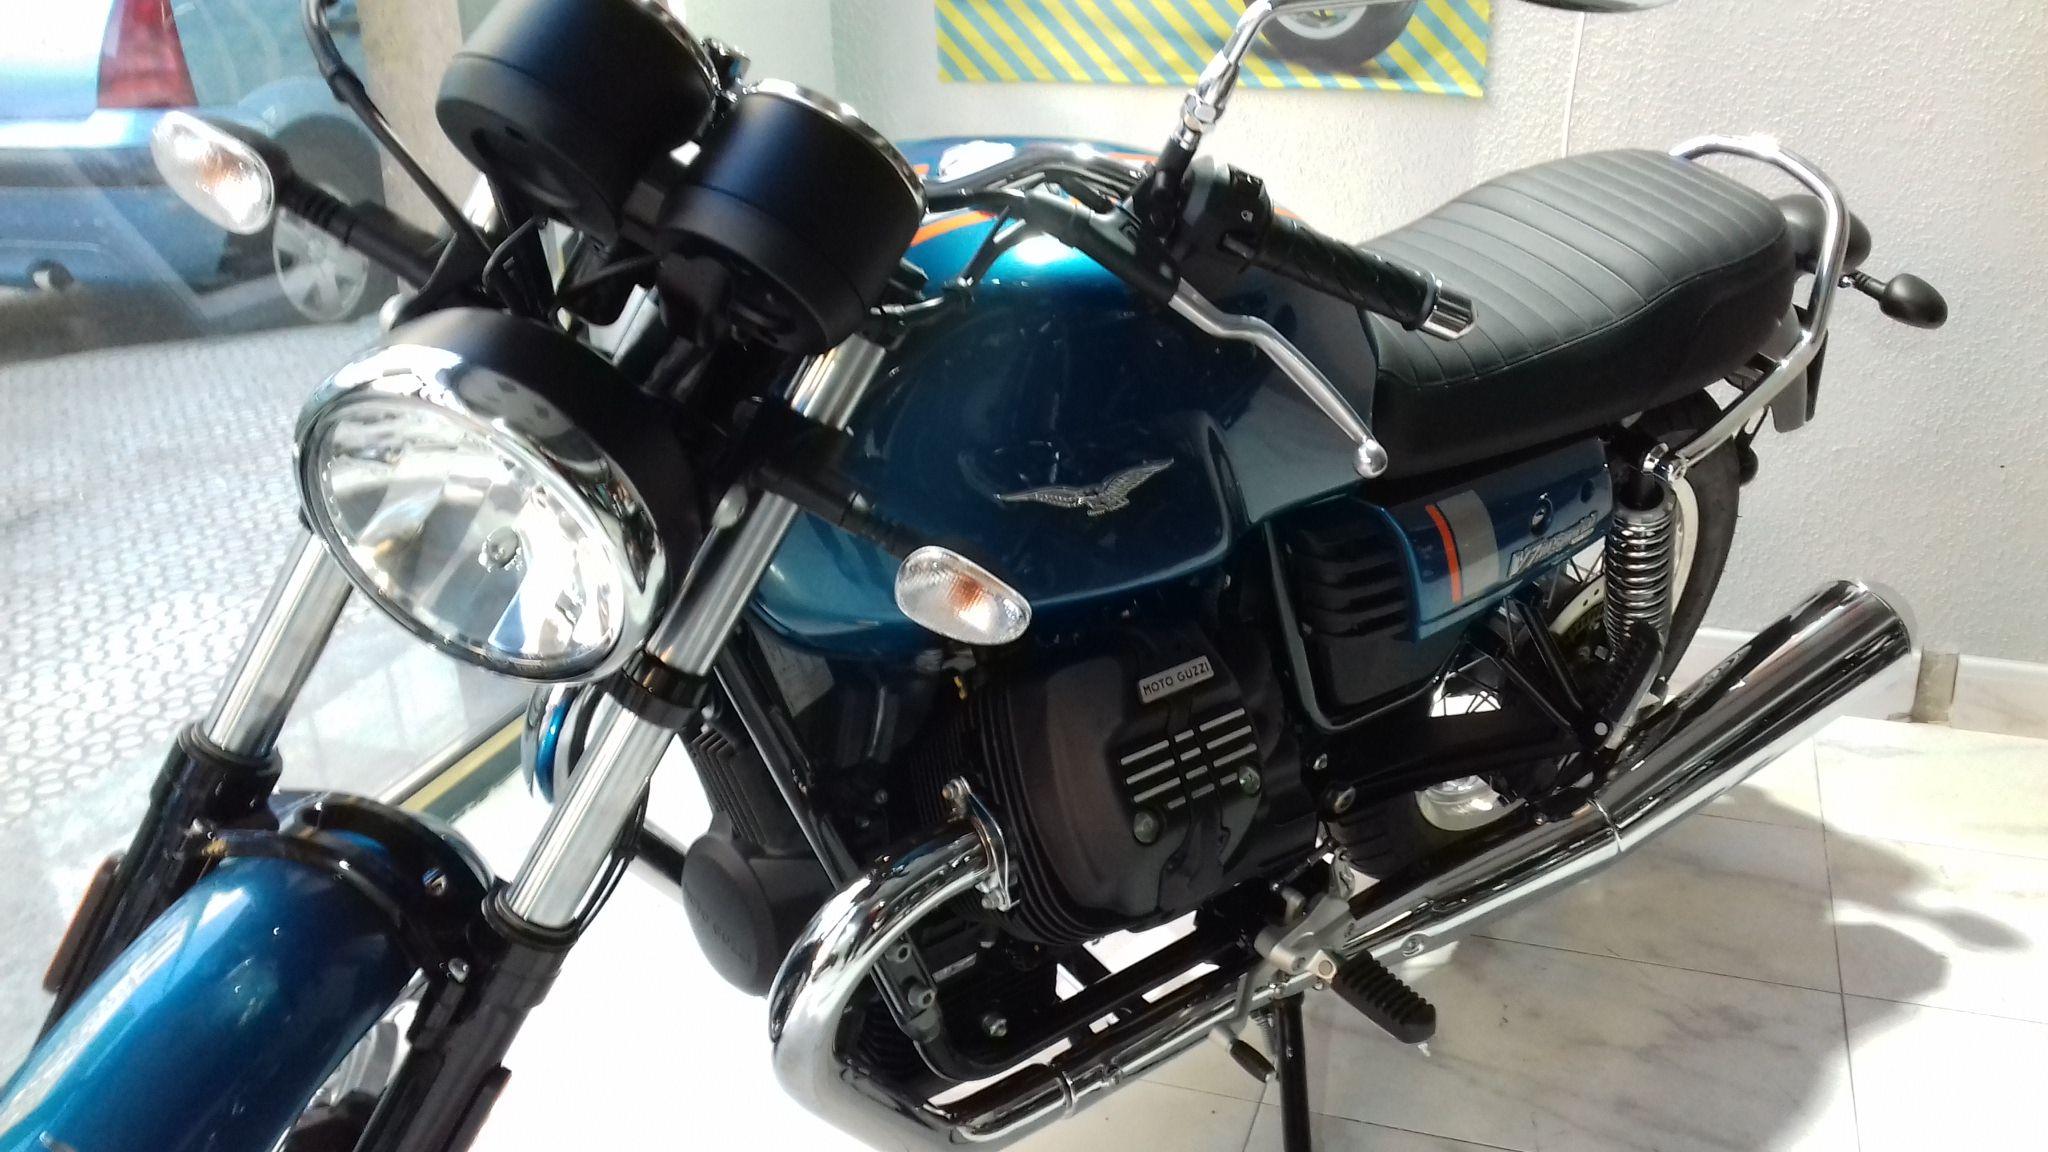 Ya puedes probar la Moto Guzzi V 7 Special